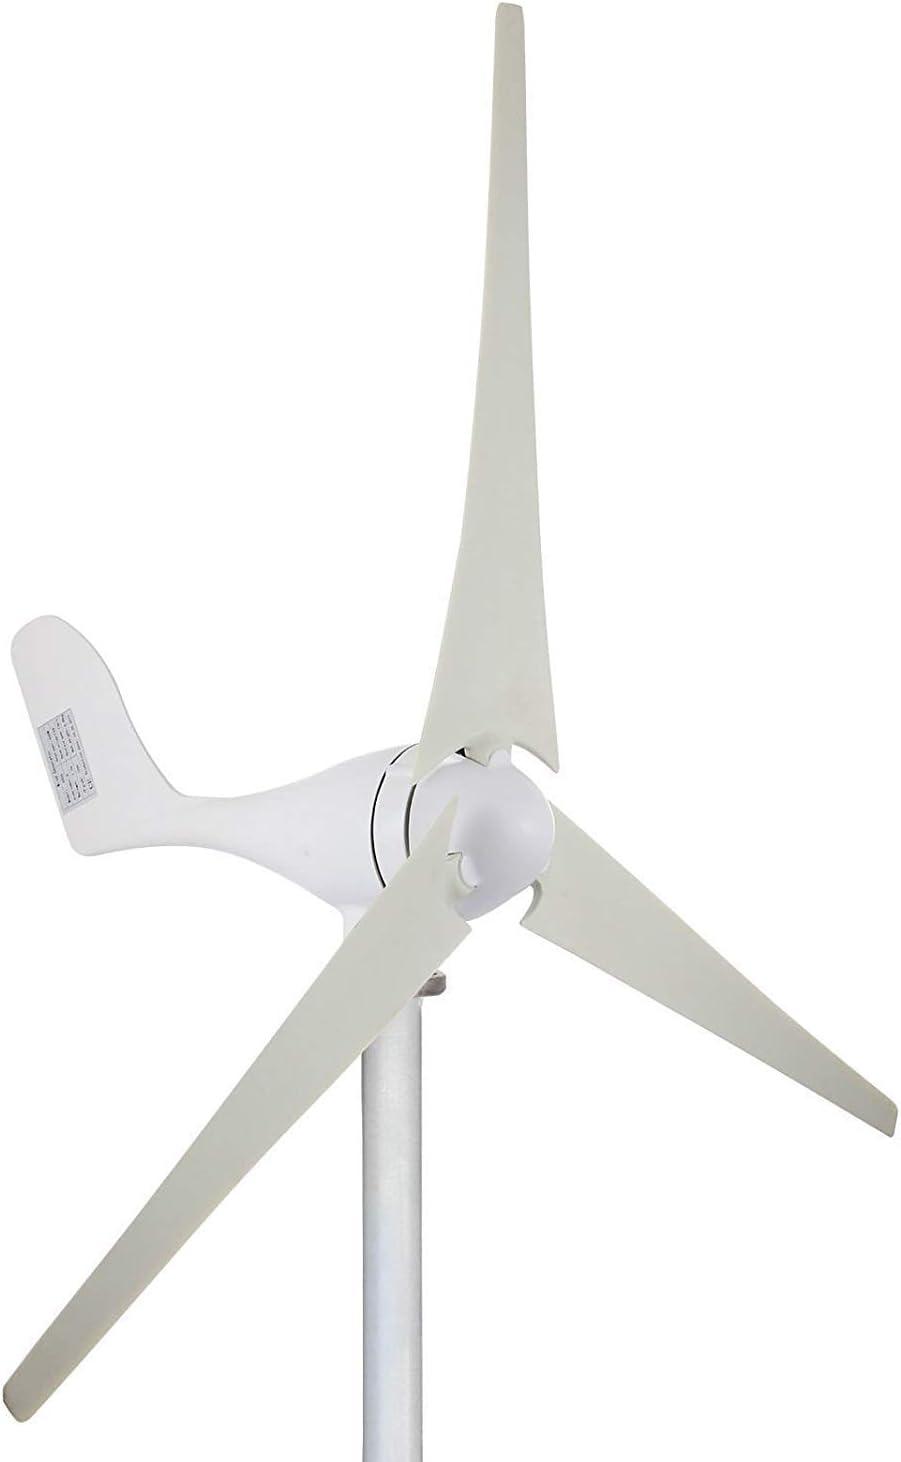 YUYUKUAILAI 700W 12V Aerogenerador Turbina de 3 Piezas Kit de Controlador de Carga MPPT Horizontal energía eólica Add-on (700W 24V),100W